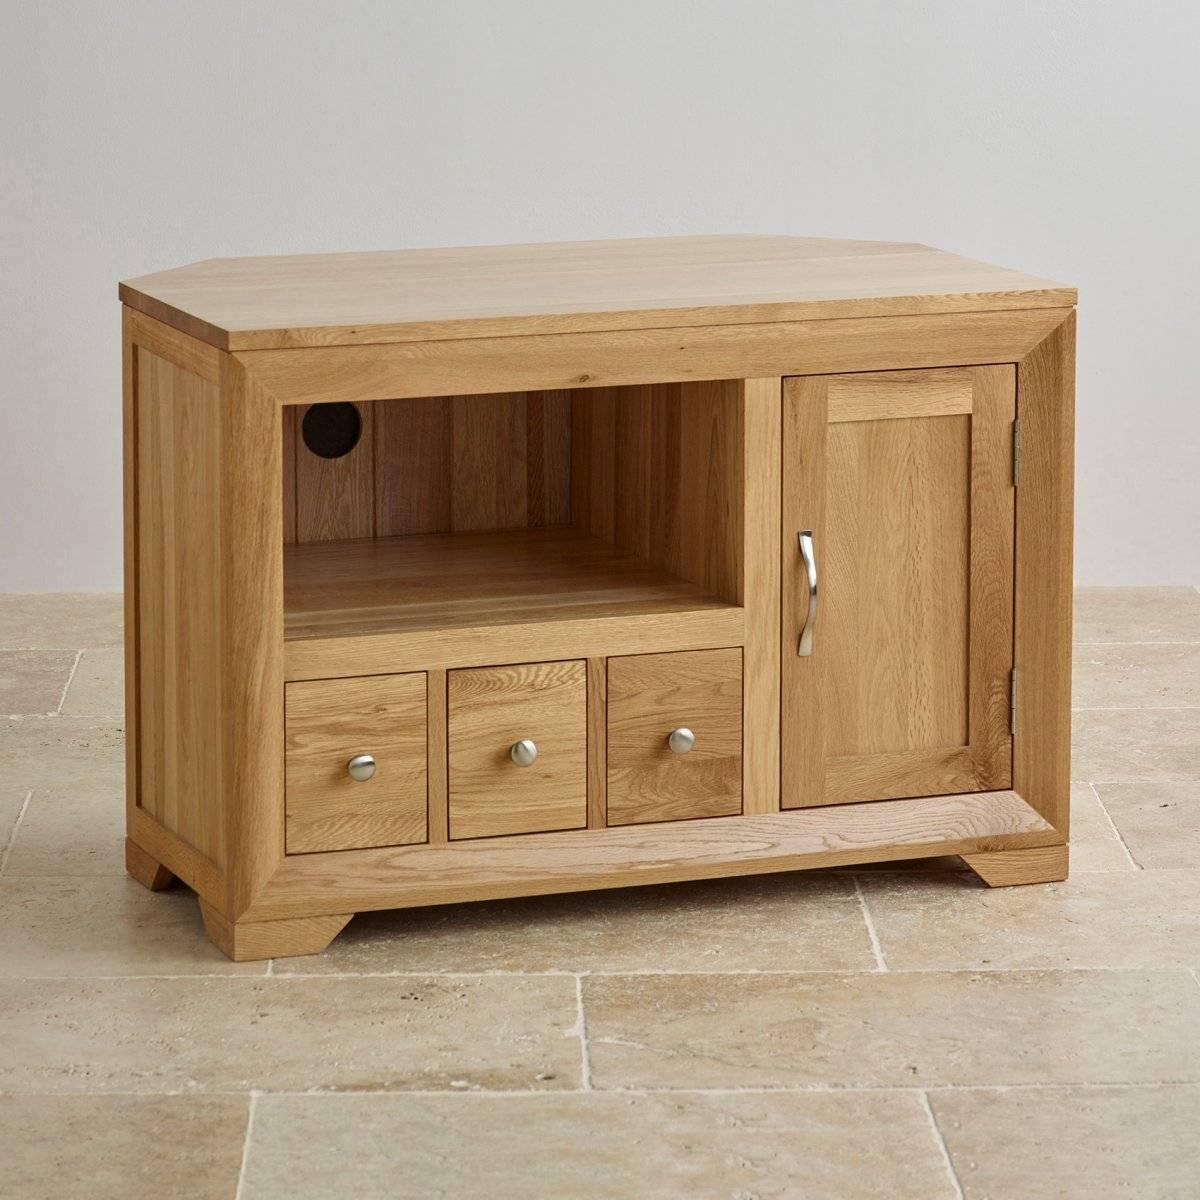 Bevel Small Corner Tv Cabinet In Solid Oak | Oak Furniture Land Pertaining To Oak Corner Tv Cabinets (View 4 of 15)